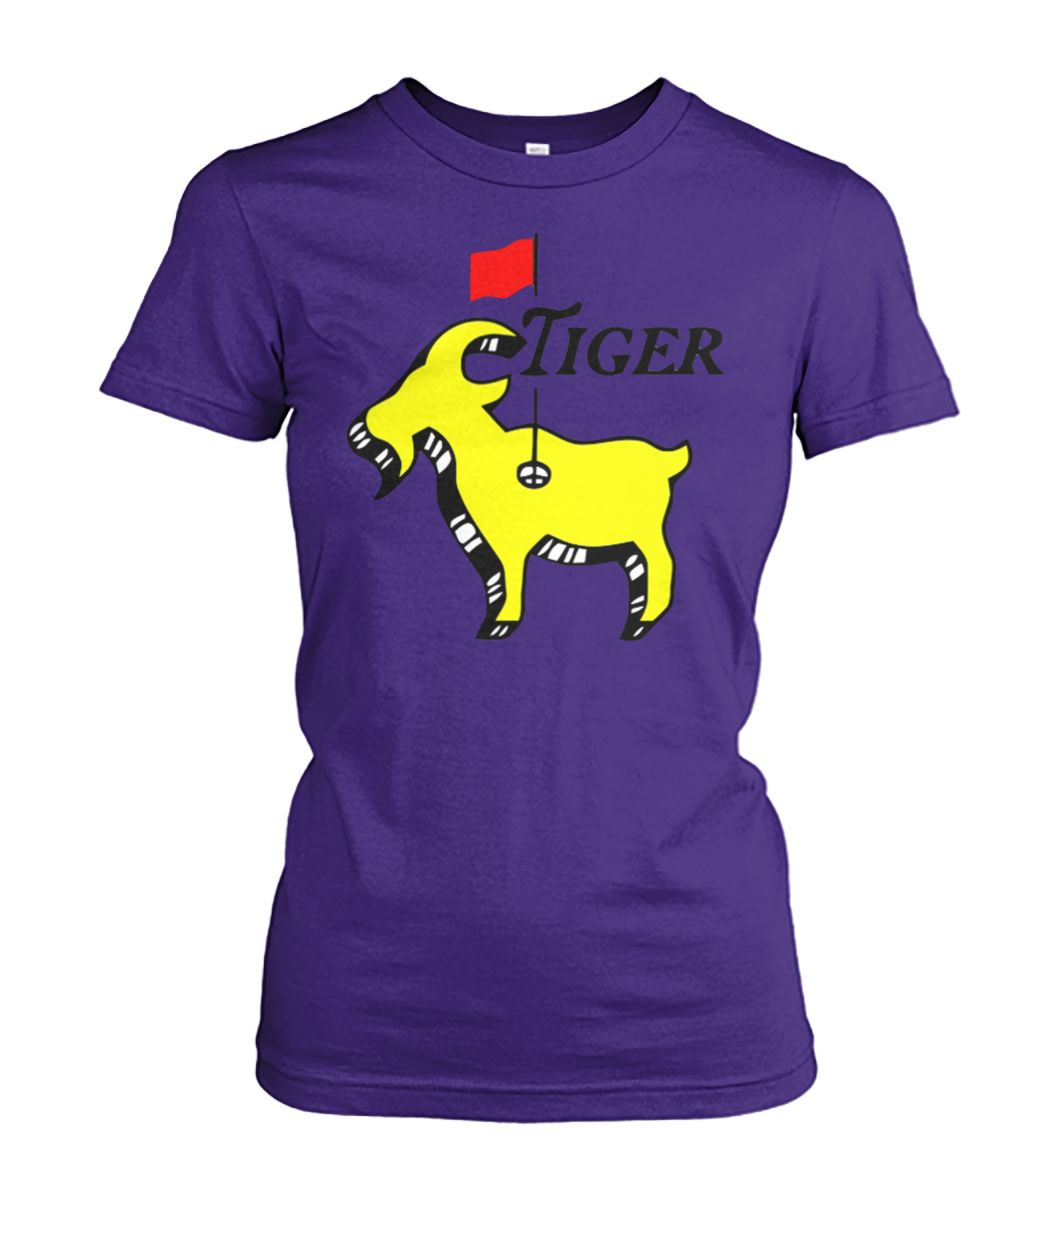 [Hot version] Tiger woods goat masters shirt